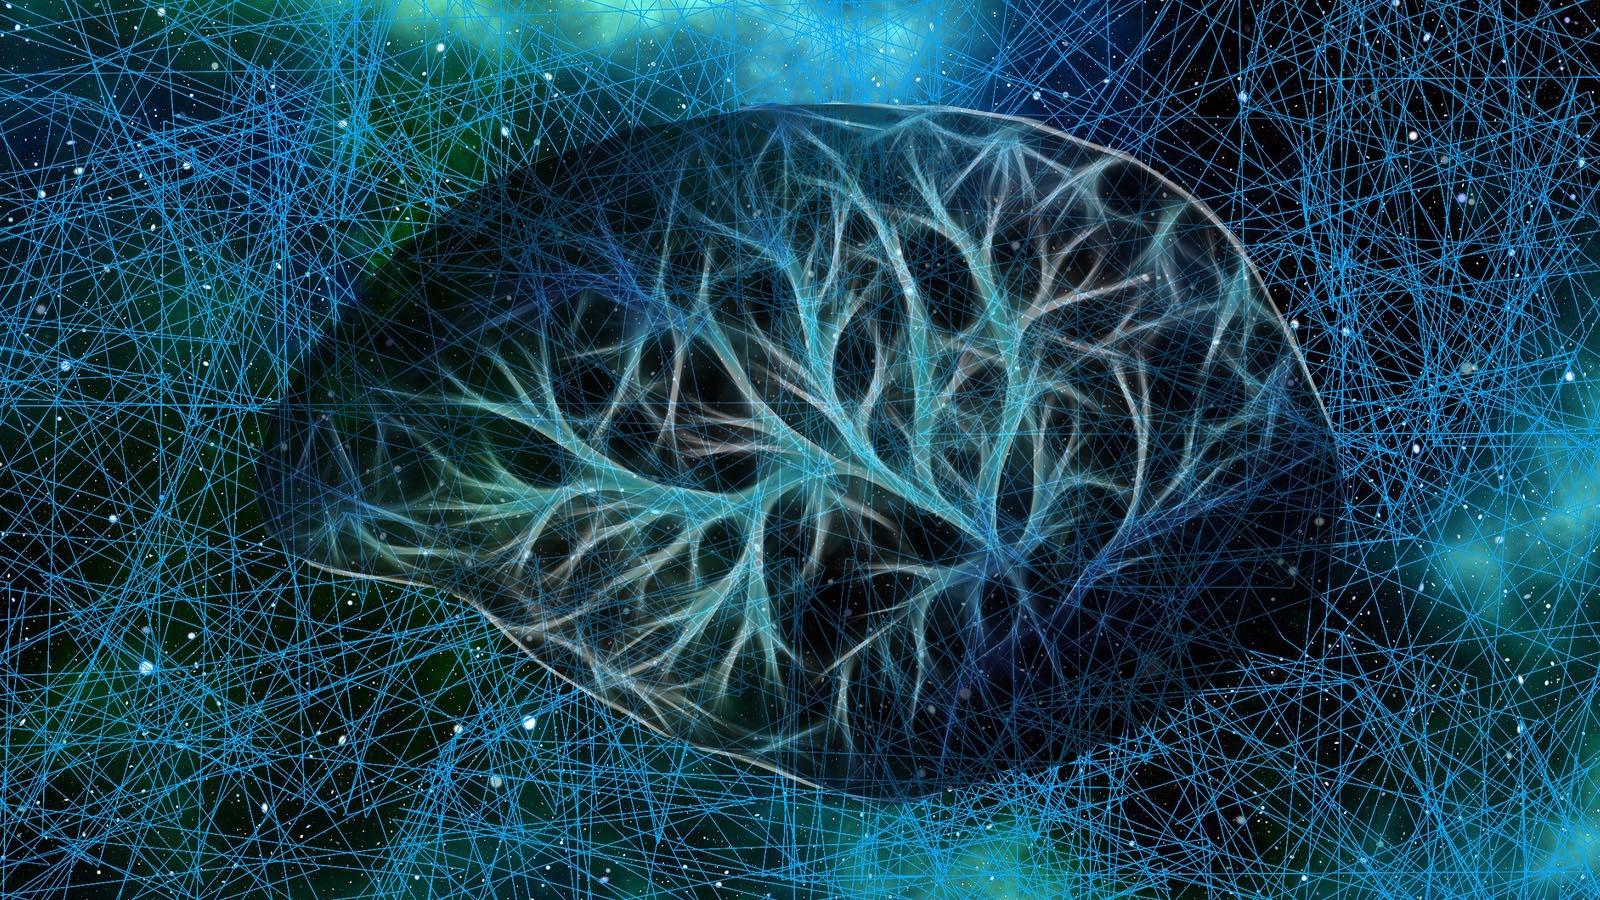 The Virus, Memory, Mandela Effect Connection